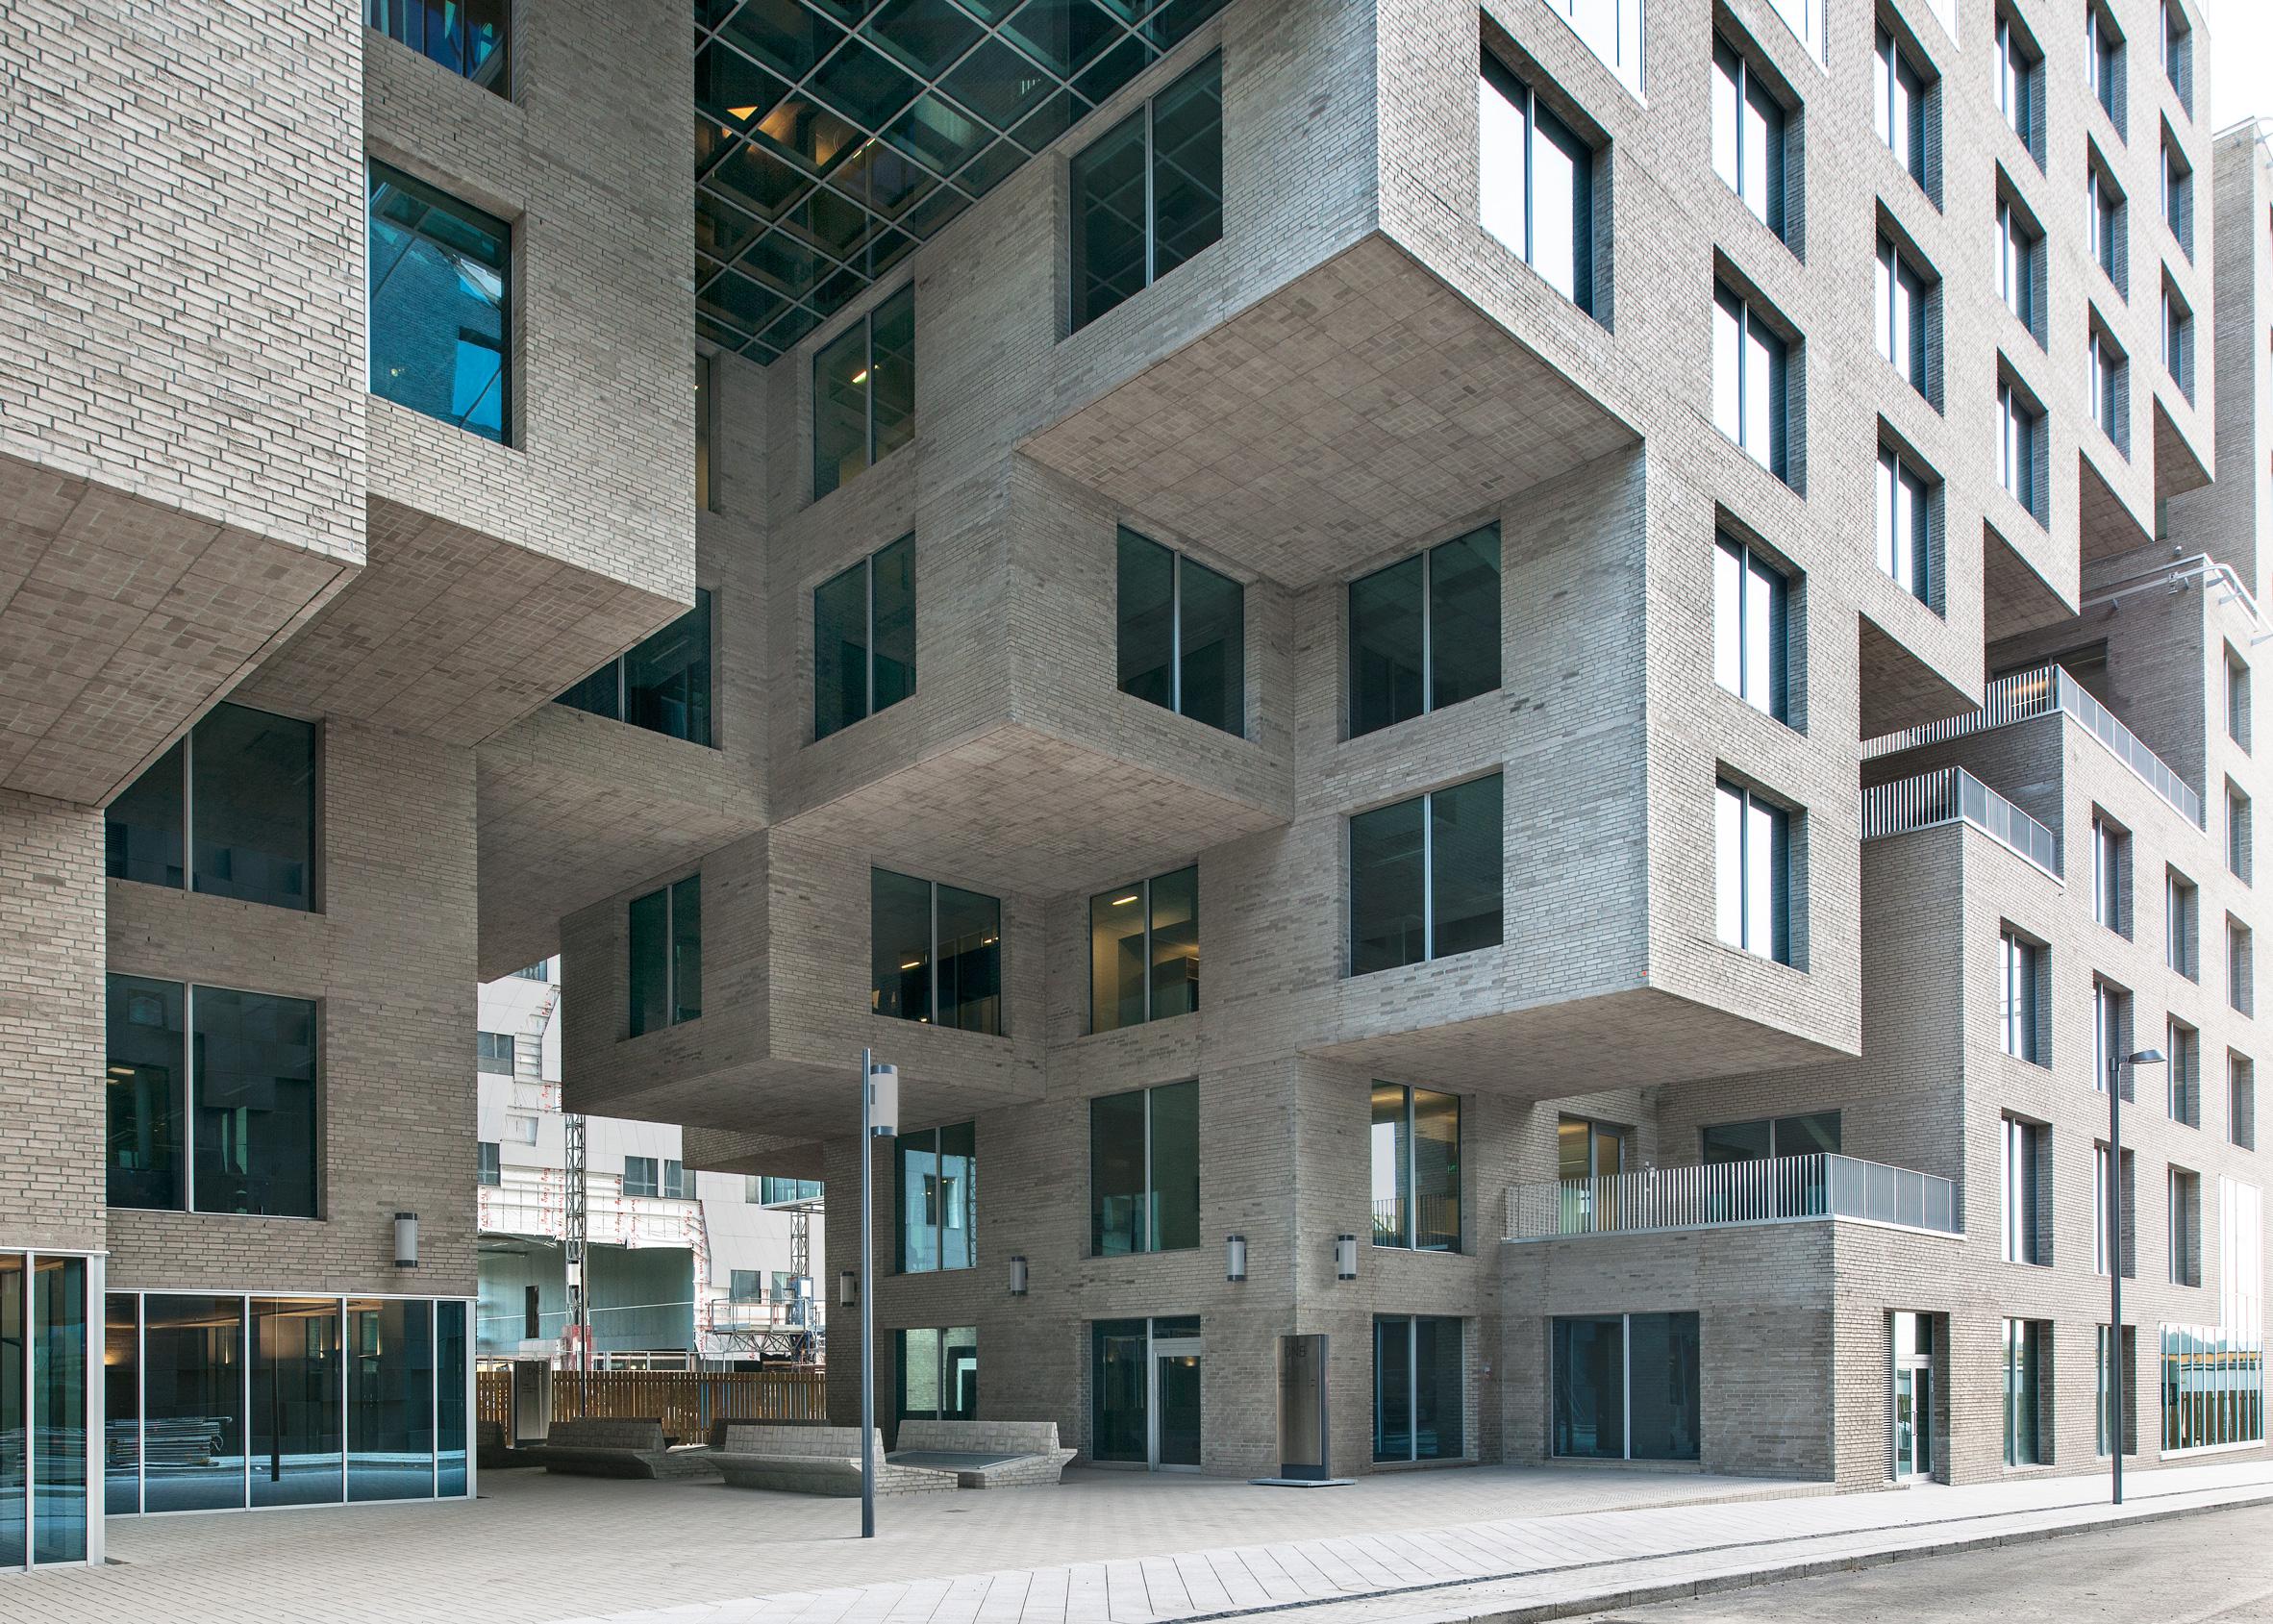 DNB Bank Headquarters by MVRDV, Oslo, Norway